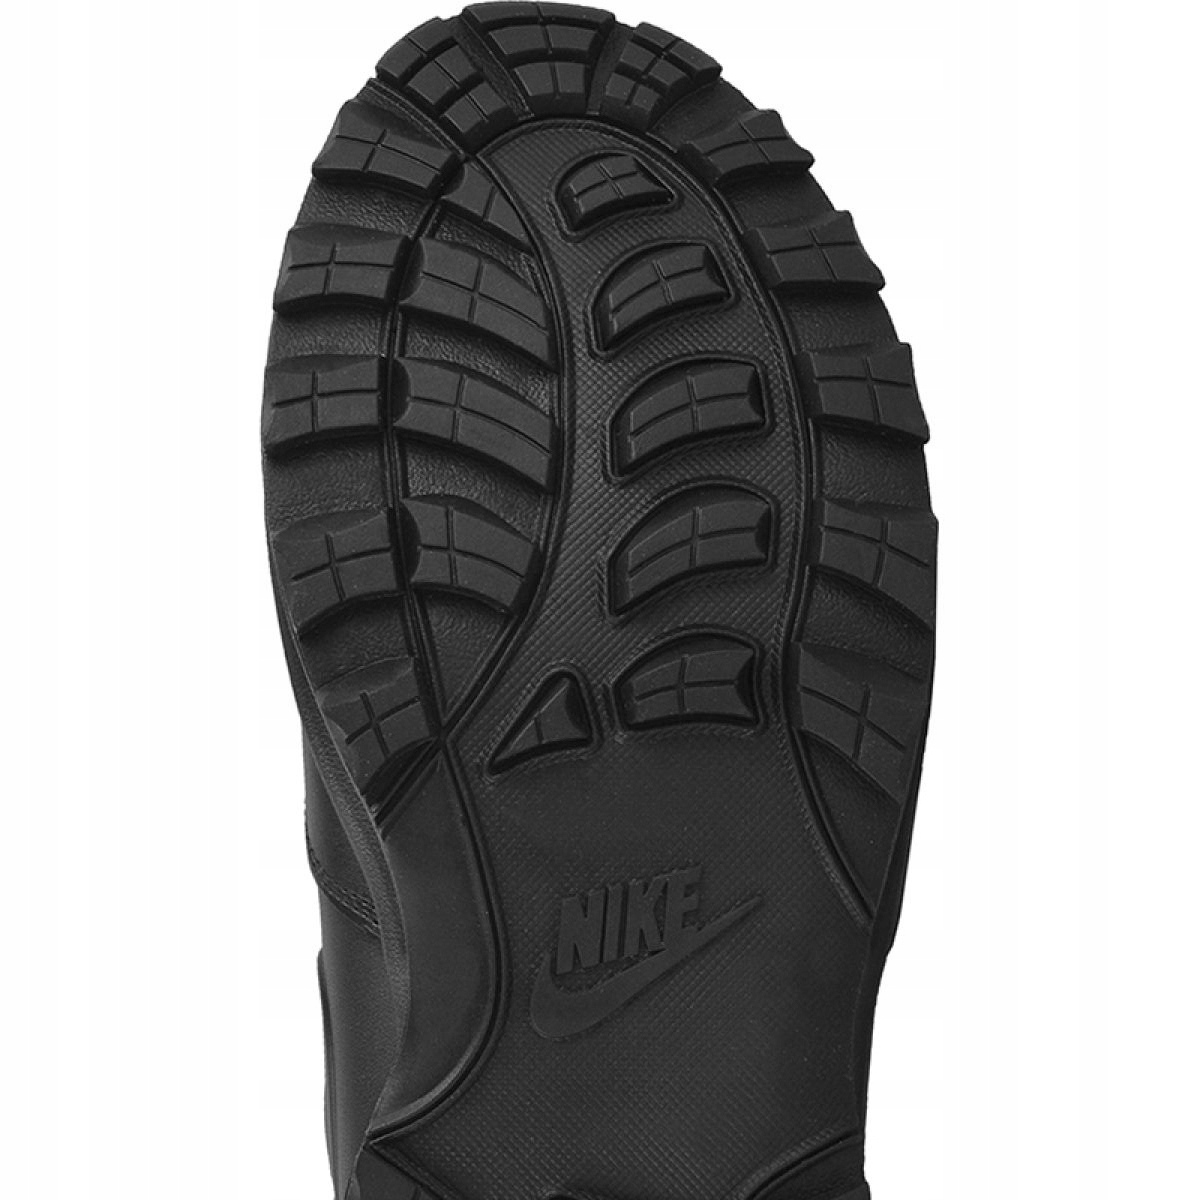 Invierno Negro 003 454350 Zapatos De Nike Leather M Manoa